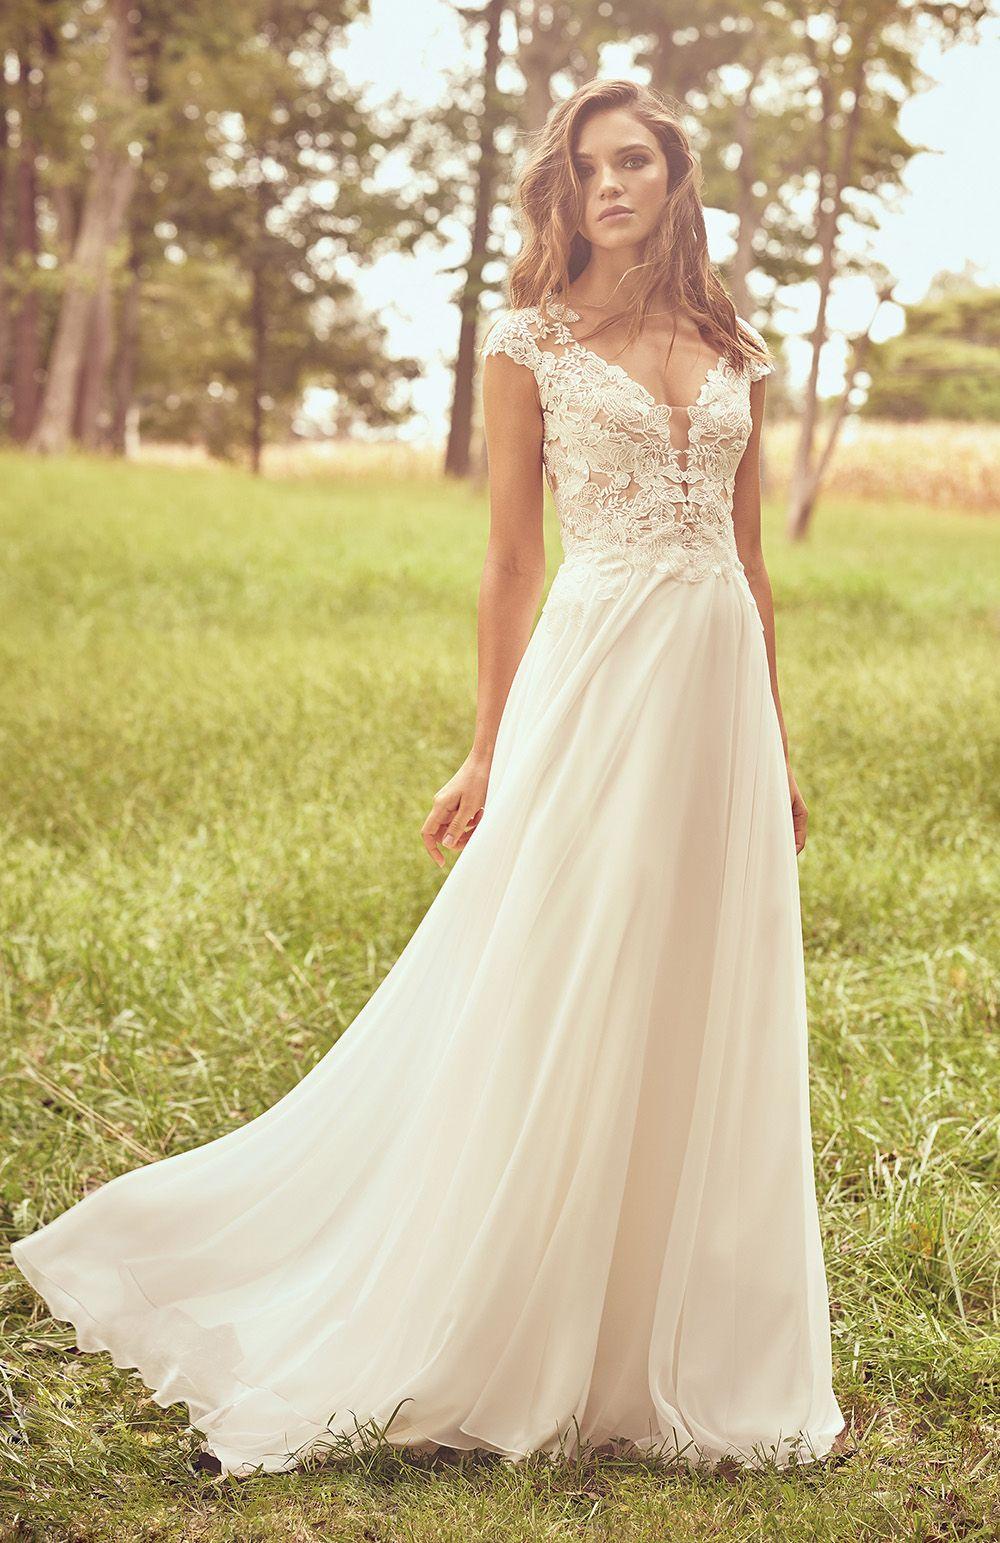 Robe De Mariee Modele Noa Couture Nuptiale Paris Robes Lillian West Lillian West Lillian West Wedding Dress A Line Wedding Dress Lillian West Bridal